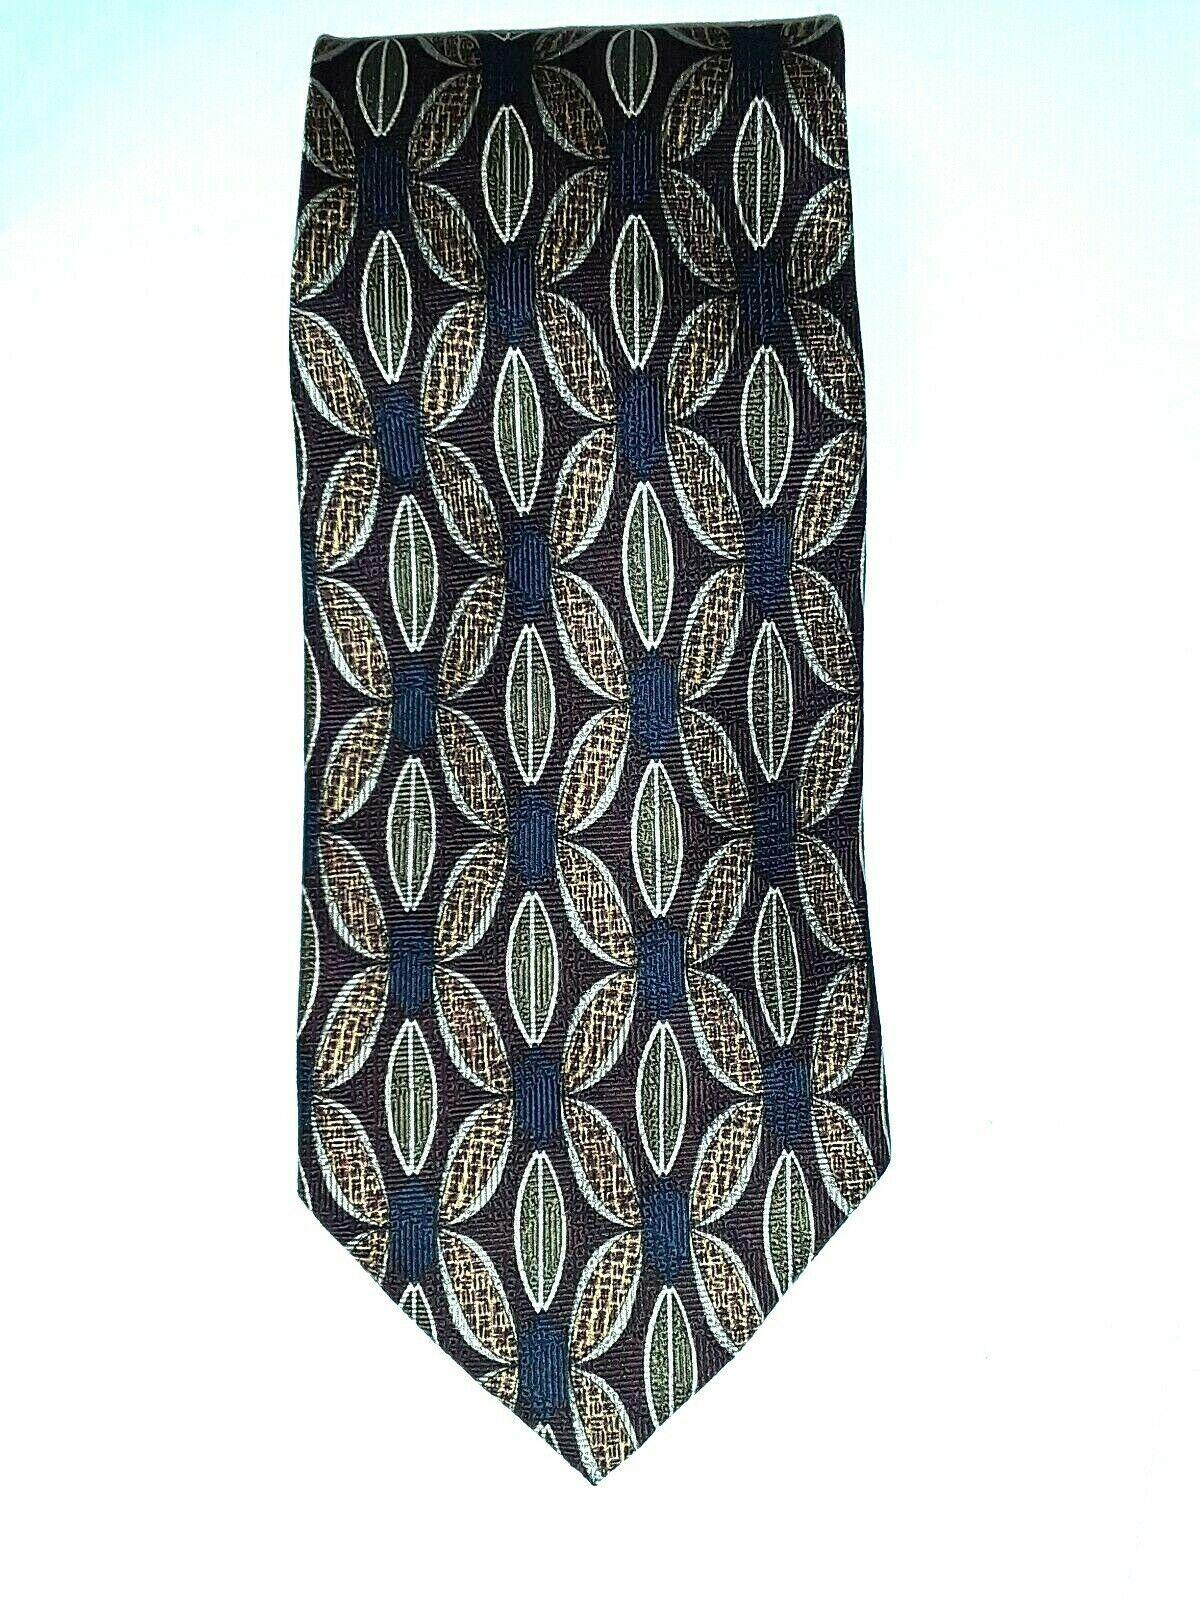 "Louis Roth Men's Tie Necktie 100% Silk Gold Black Burgundy Geometric 59"" x 4"" image 6"